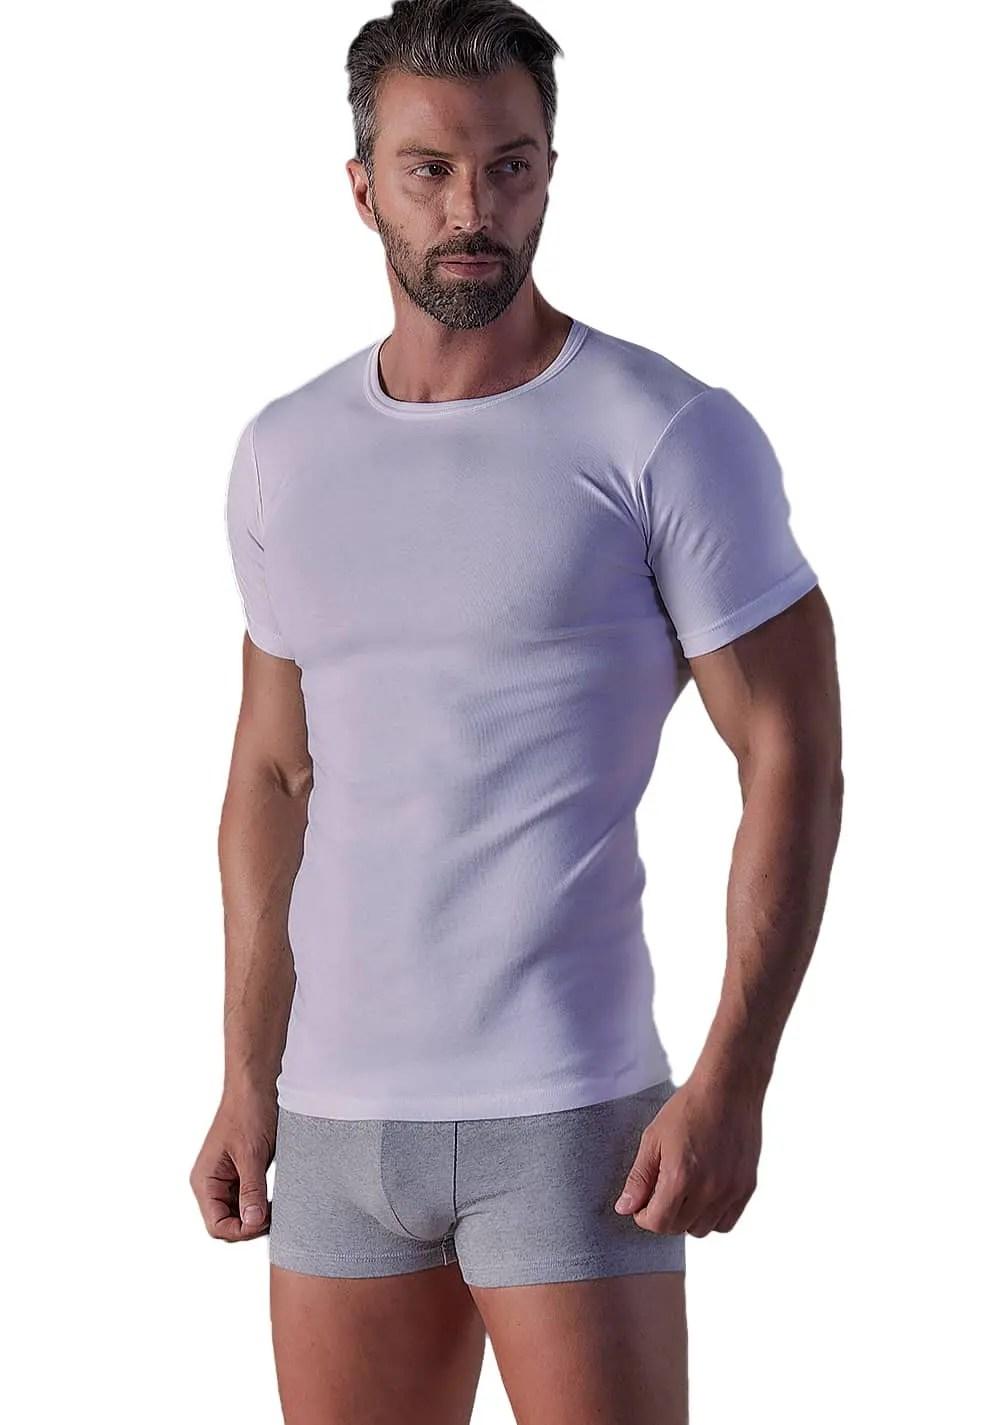 T-Shirt RIB Με Λαιμόκοψη Wrap 311004 (2 Pack) - My Wrap